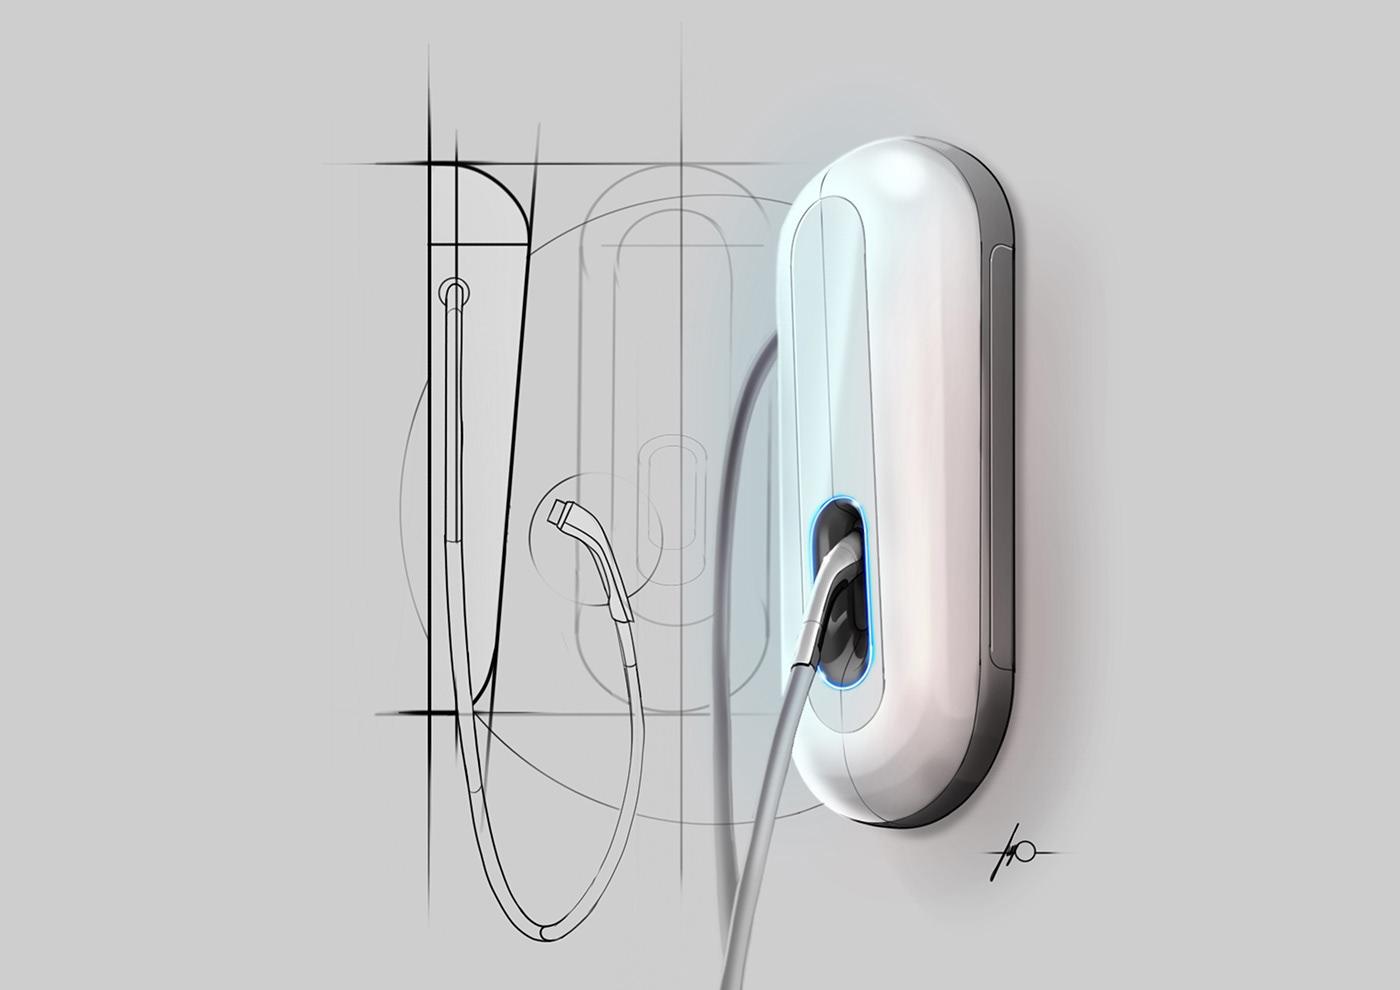 sketches sketchbook concepts headphones chair dishwasher AC charger Bike Helmet